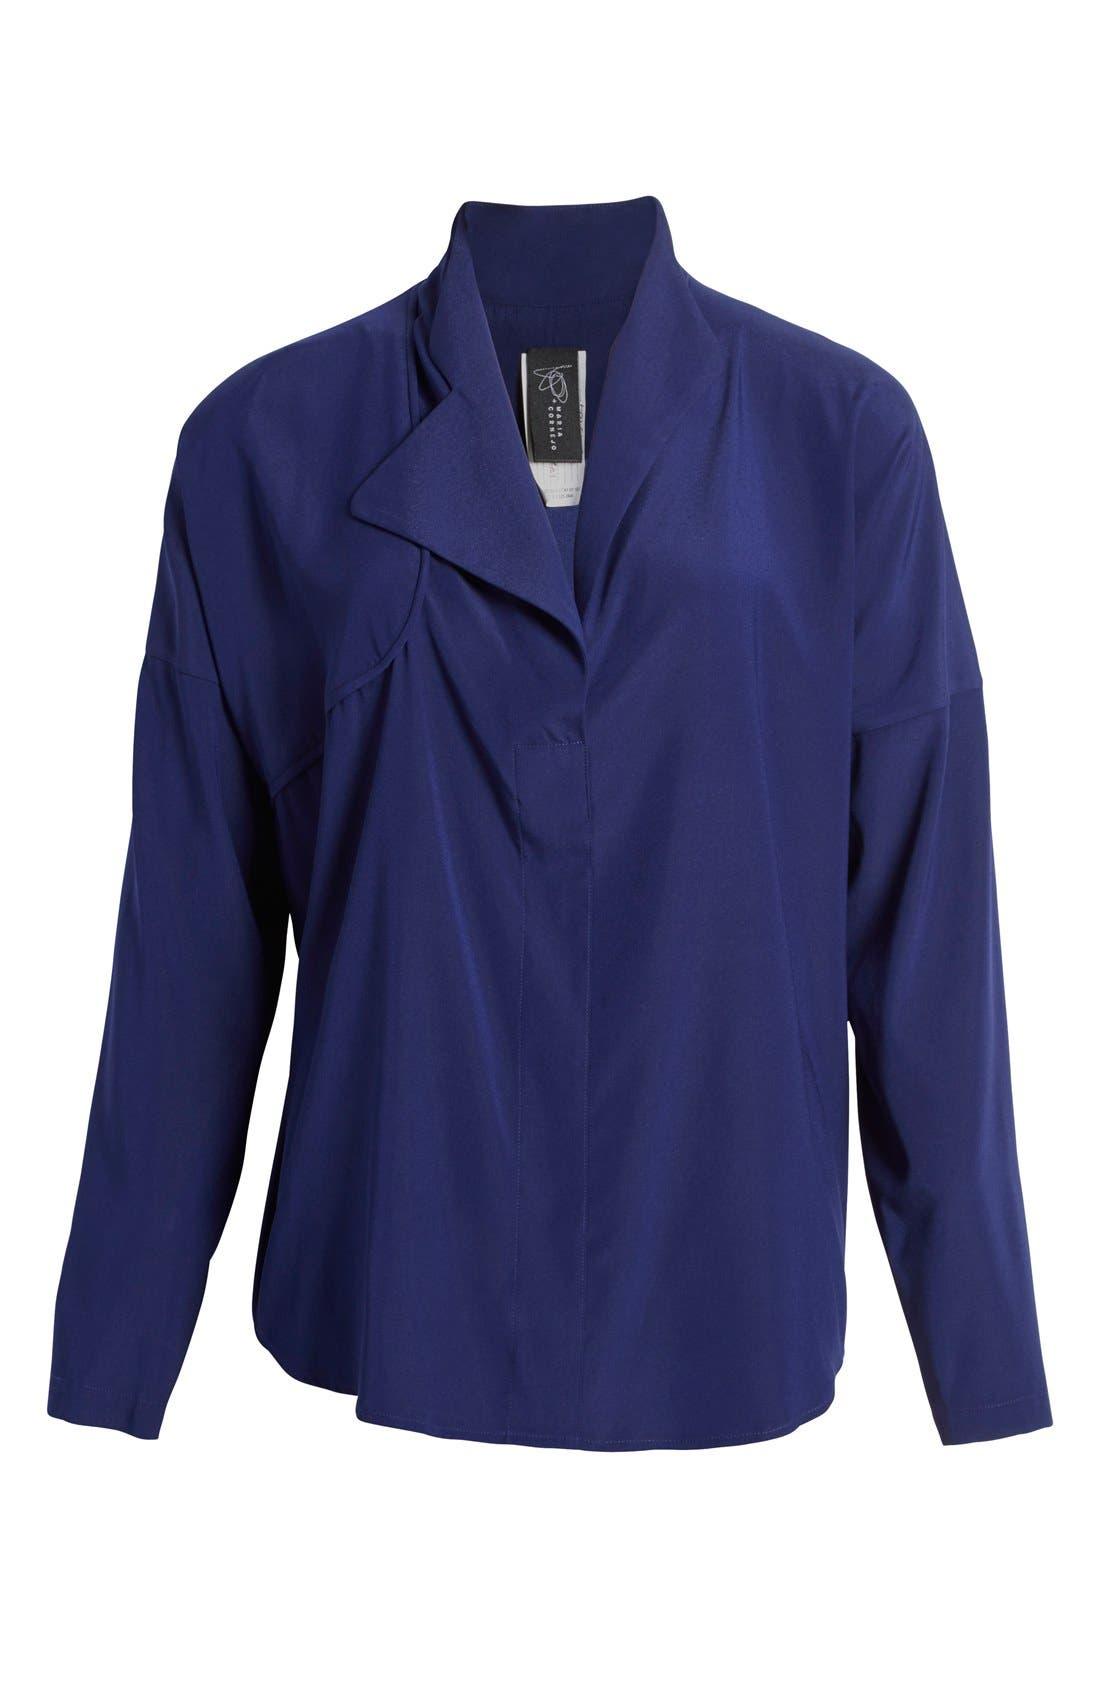 Alternate Image 4  - Zero + Maria Cornejo 'Edi' Stretch Silk Charmeuse Shirt